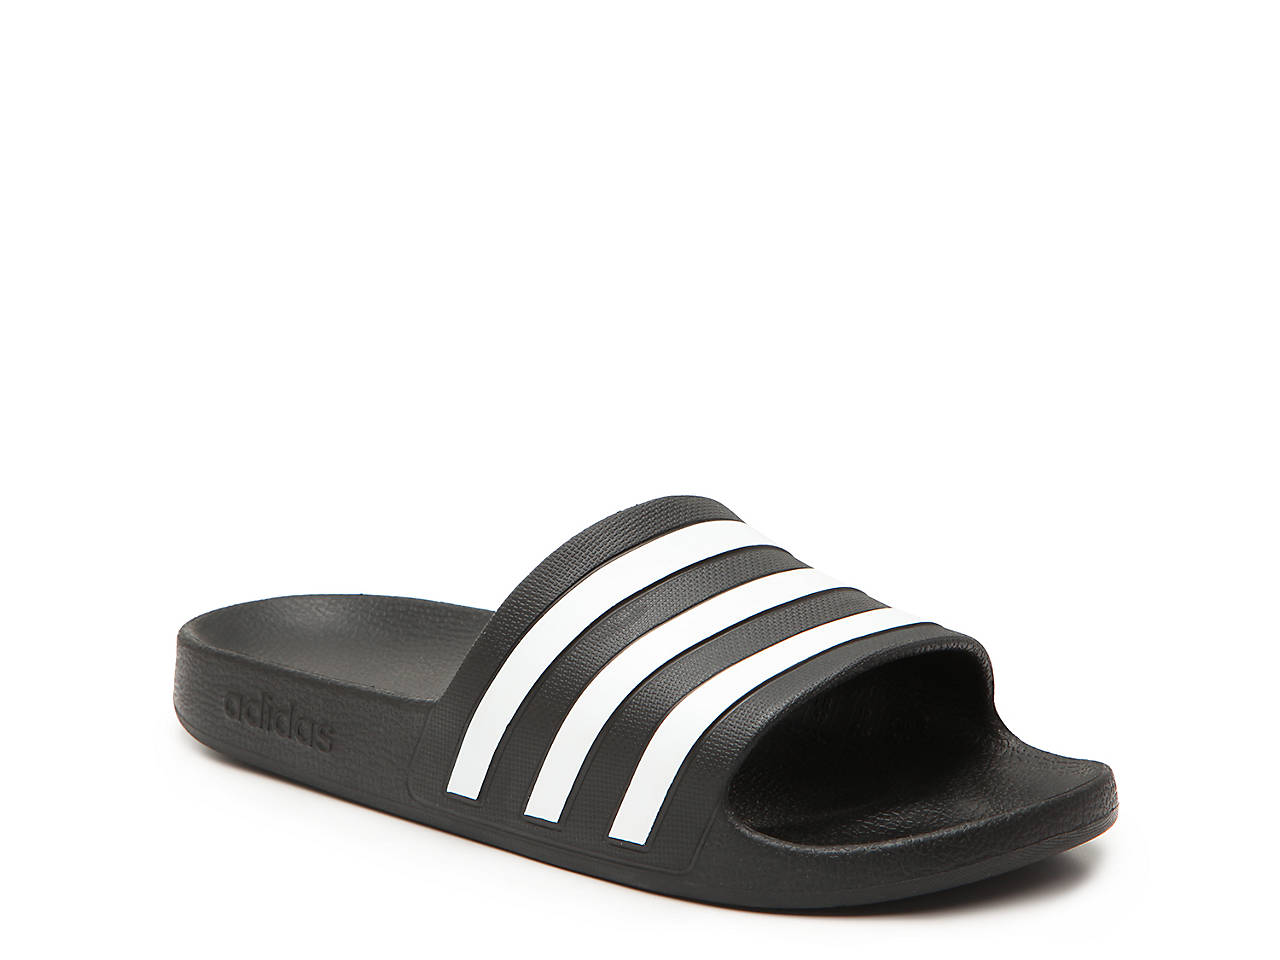 aa29d2bc77 adidas Adilette Aqua Slide Sandal - Women s Women s Shoes